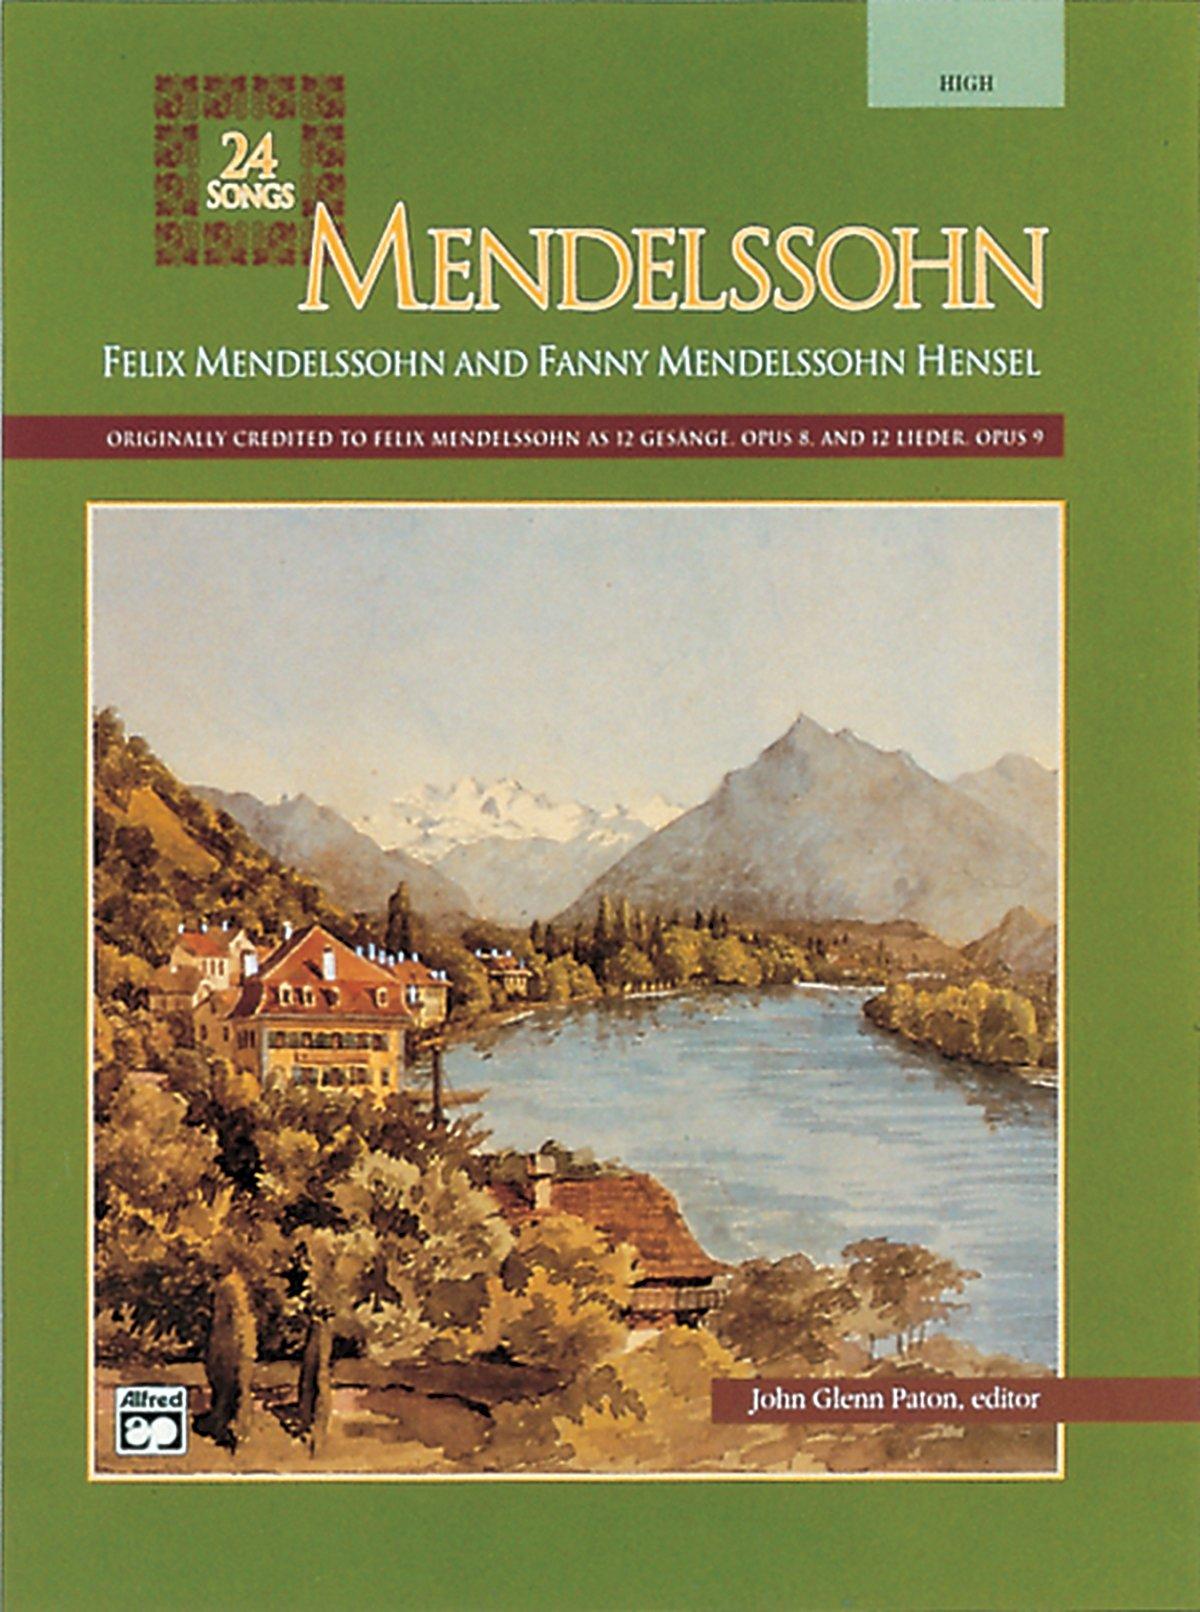 mendelssohn-24-songs-high-voice-alfred-vocal-masterworks-series